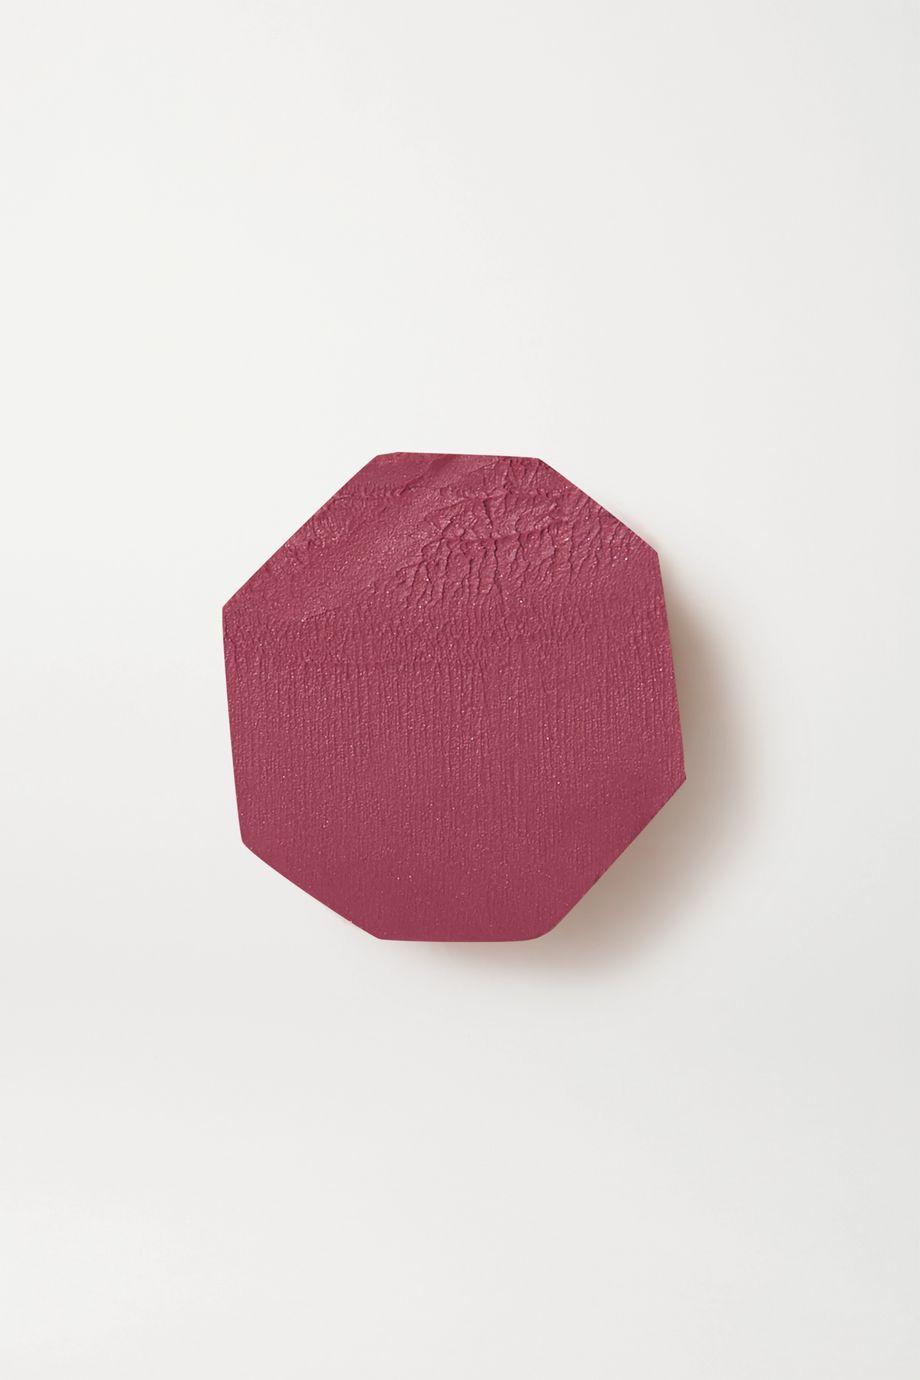 Sisley Le Phyto Rouge Lipstick - 21 Rose Nouméa